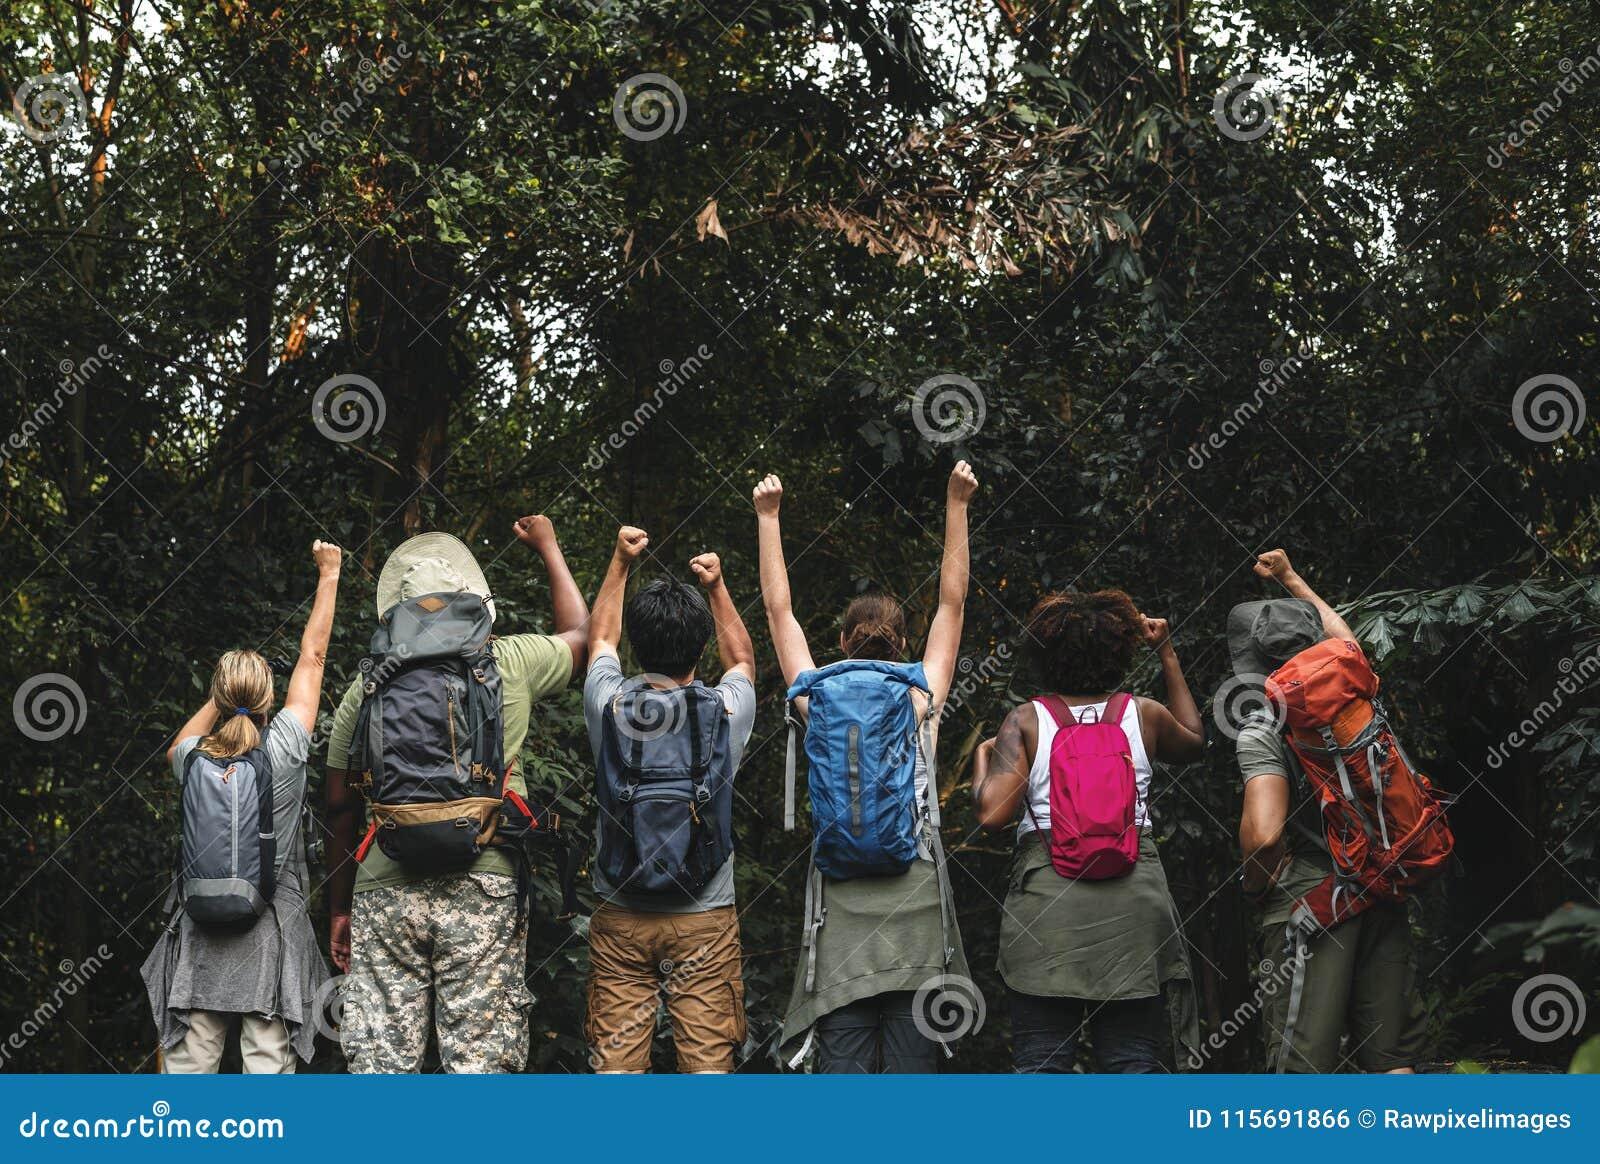 Group of happy diverse campers in trekking trip